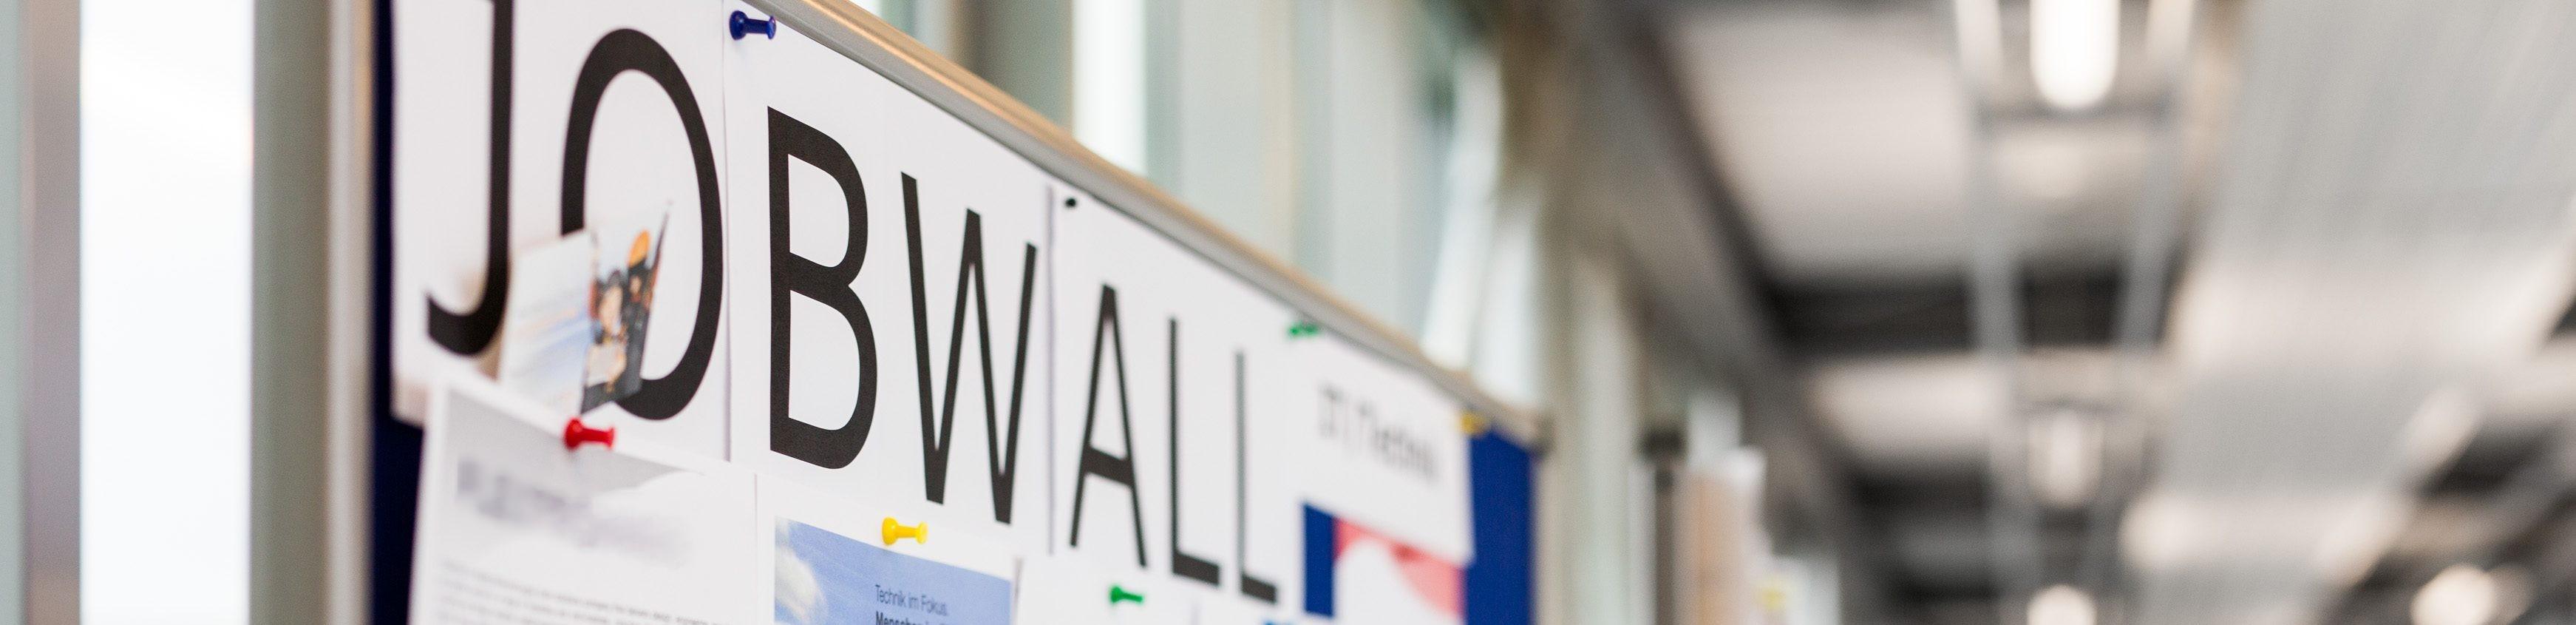 Jobwall mit Stellenangeboten (Bildausschnitt)